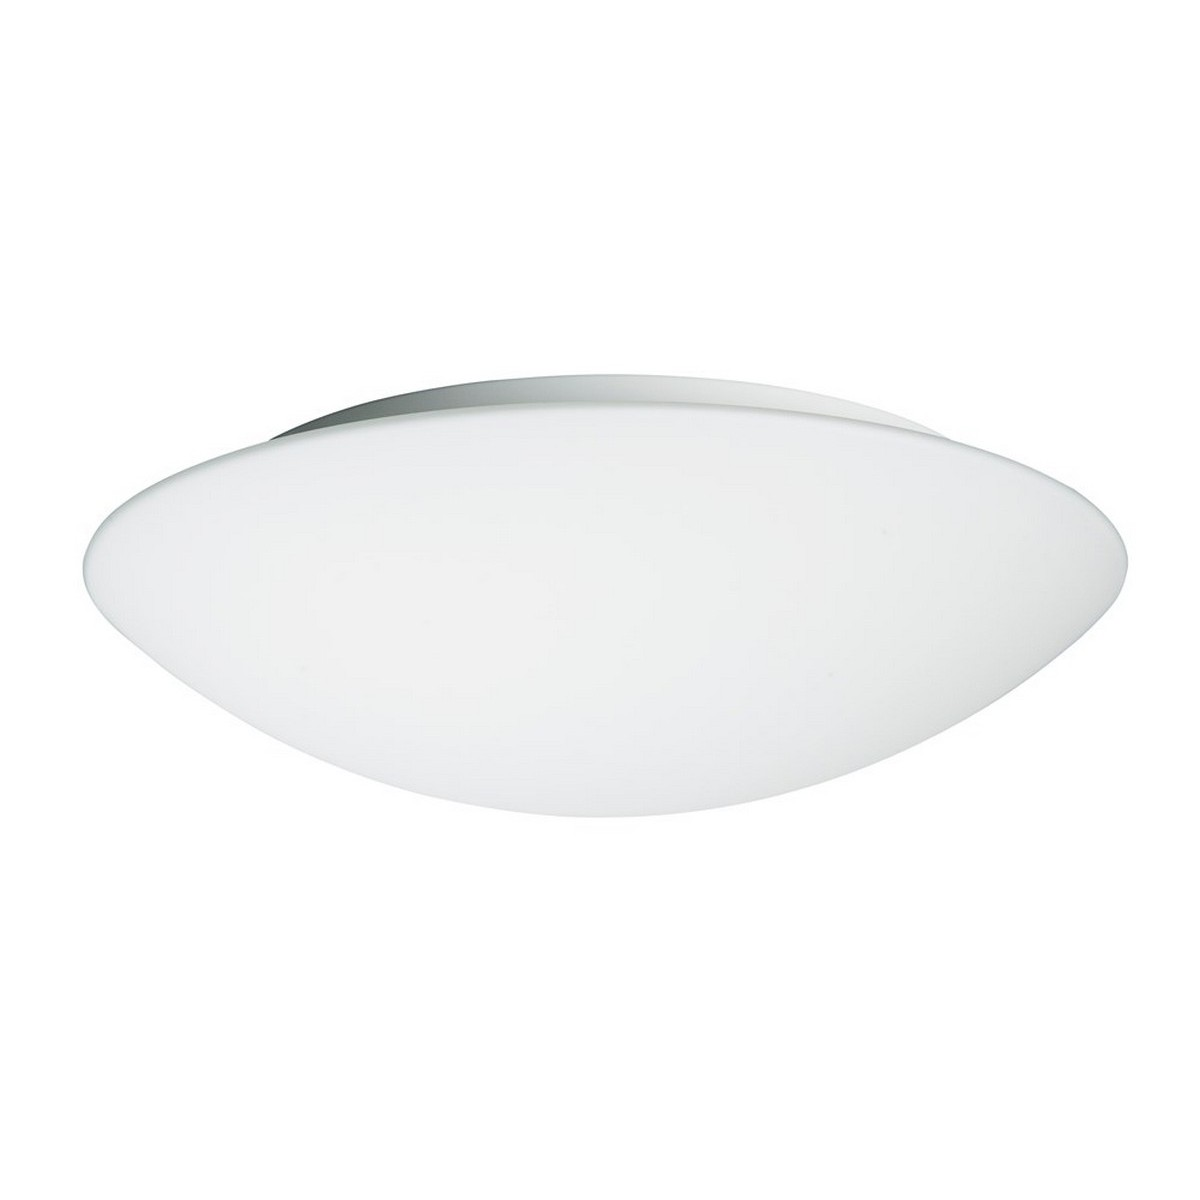 Kupol plafond D320 opal glas LED 12W Belid